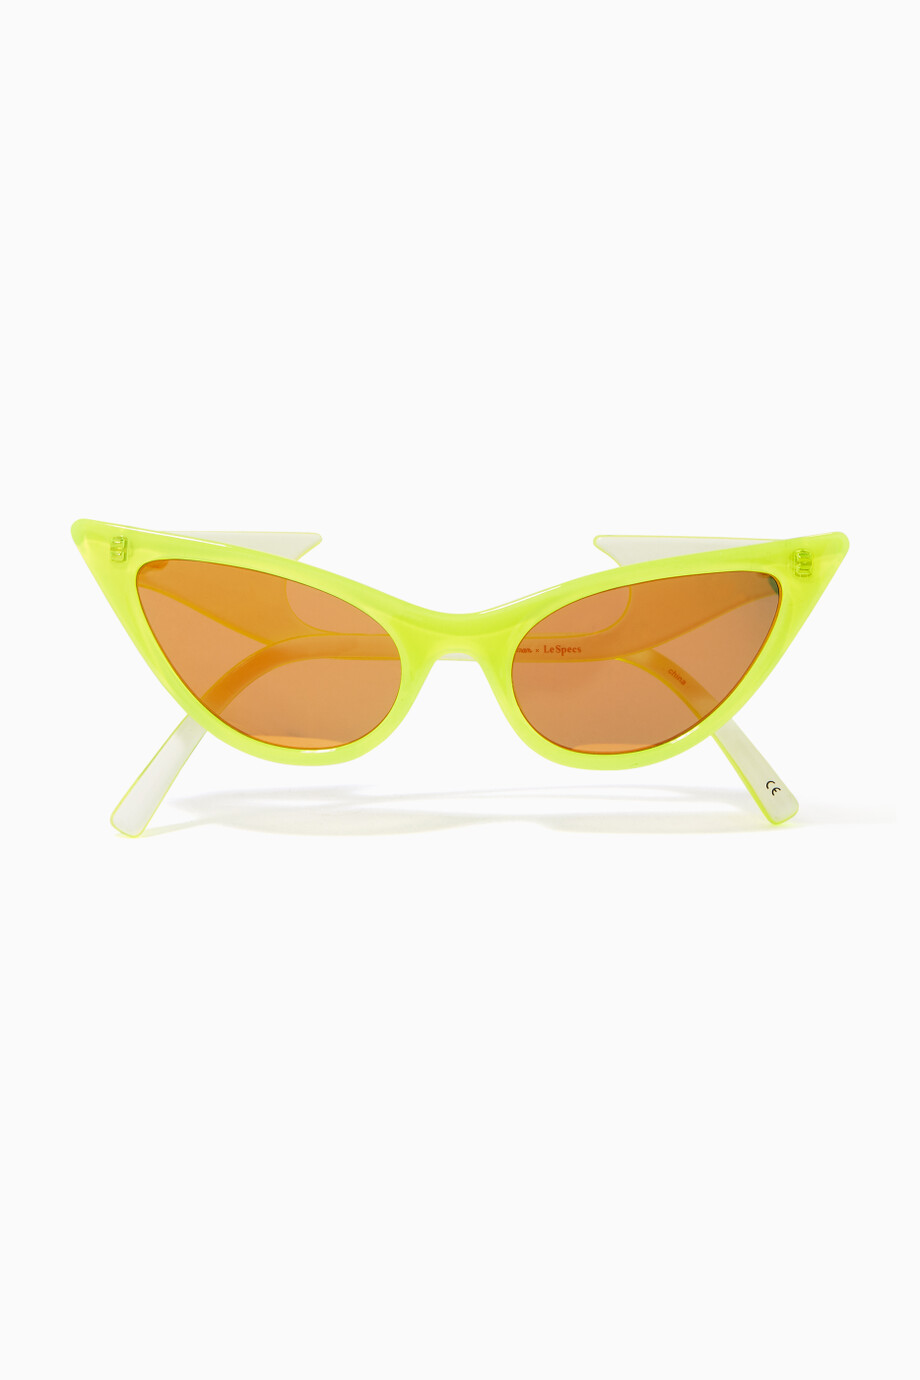 5e9cf7702a Shop Le Specs Yellow Neon Yellow The Prowler Sunglasses for Women ...